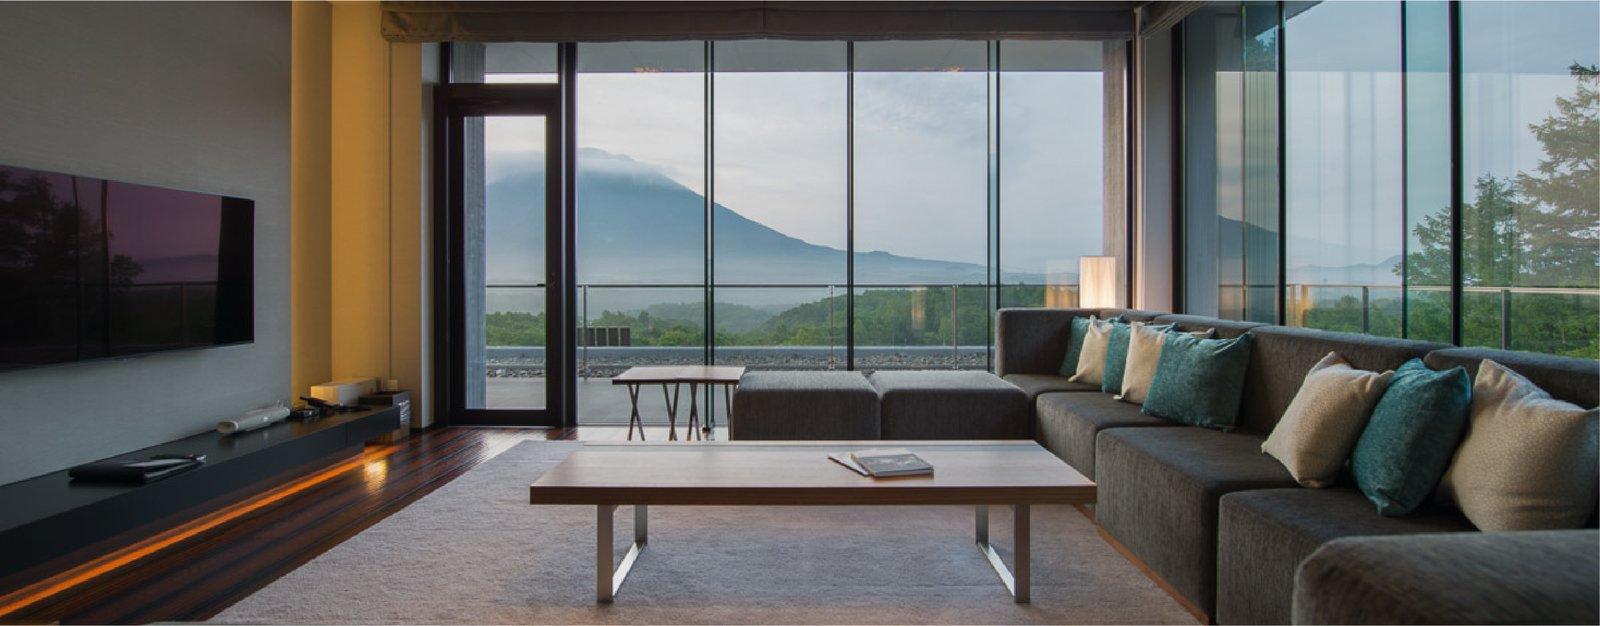 aya niseko accommodation penthouse apartment